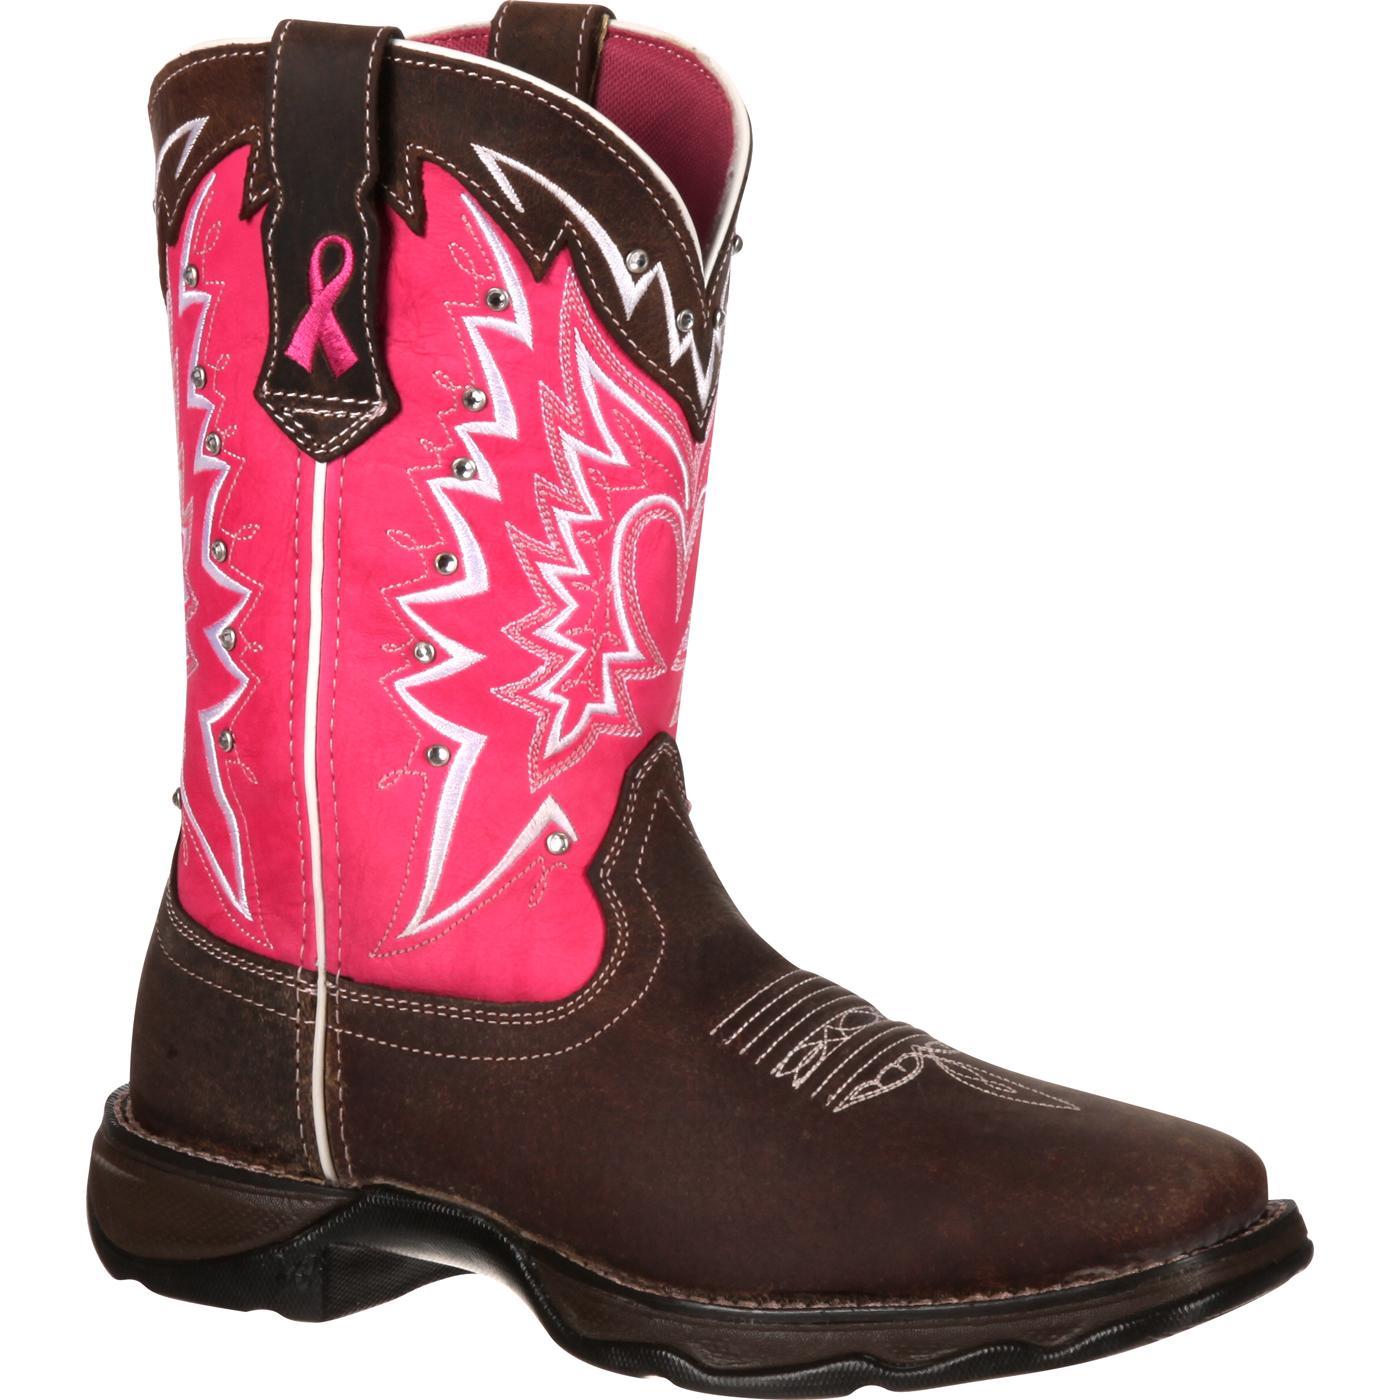 Durango: Women's Pink Ribbon Cancer Benefit Western Boots